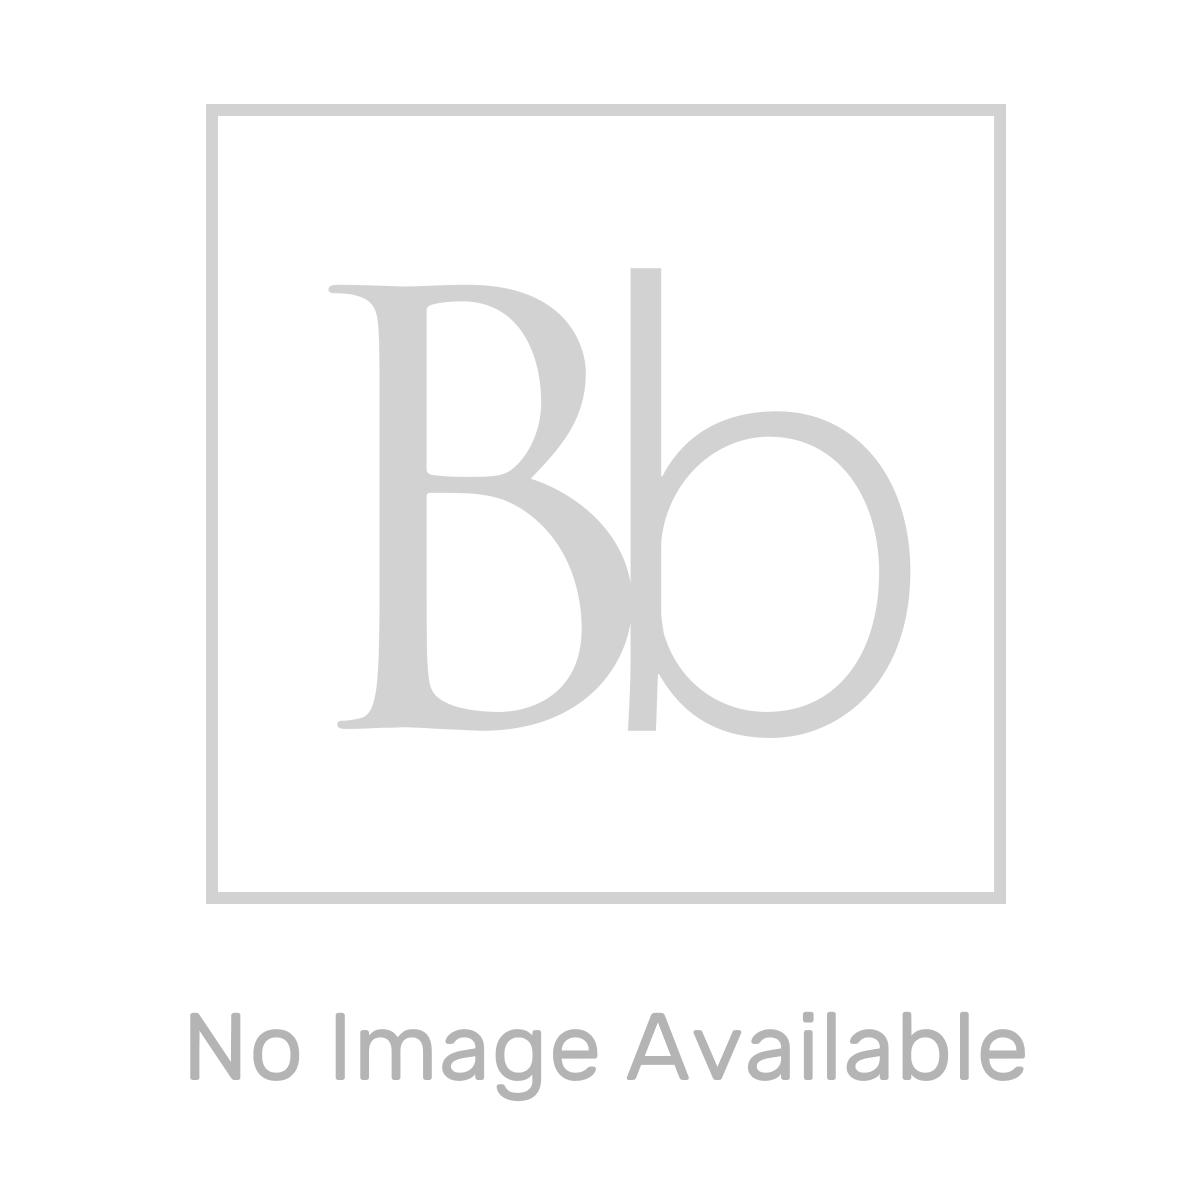 Bali White Ash Vanity Unit 900mm